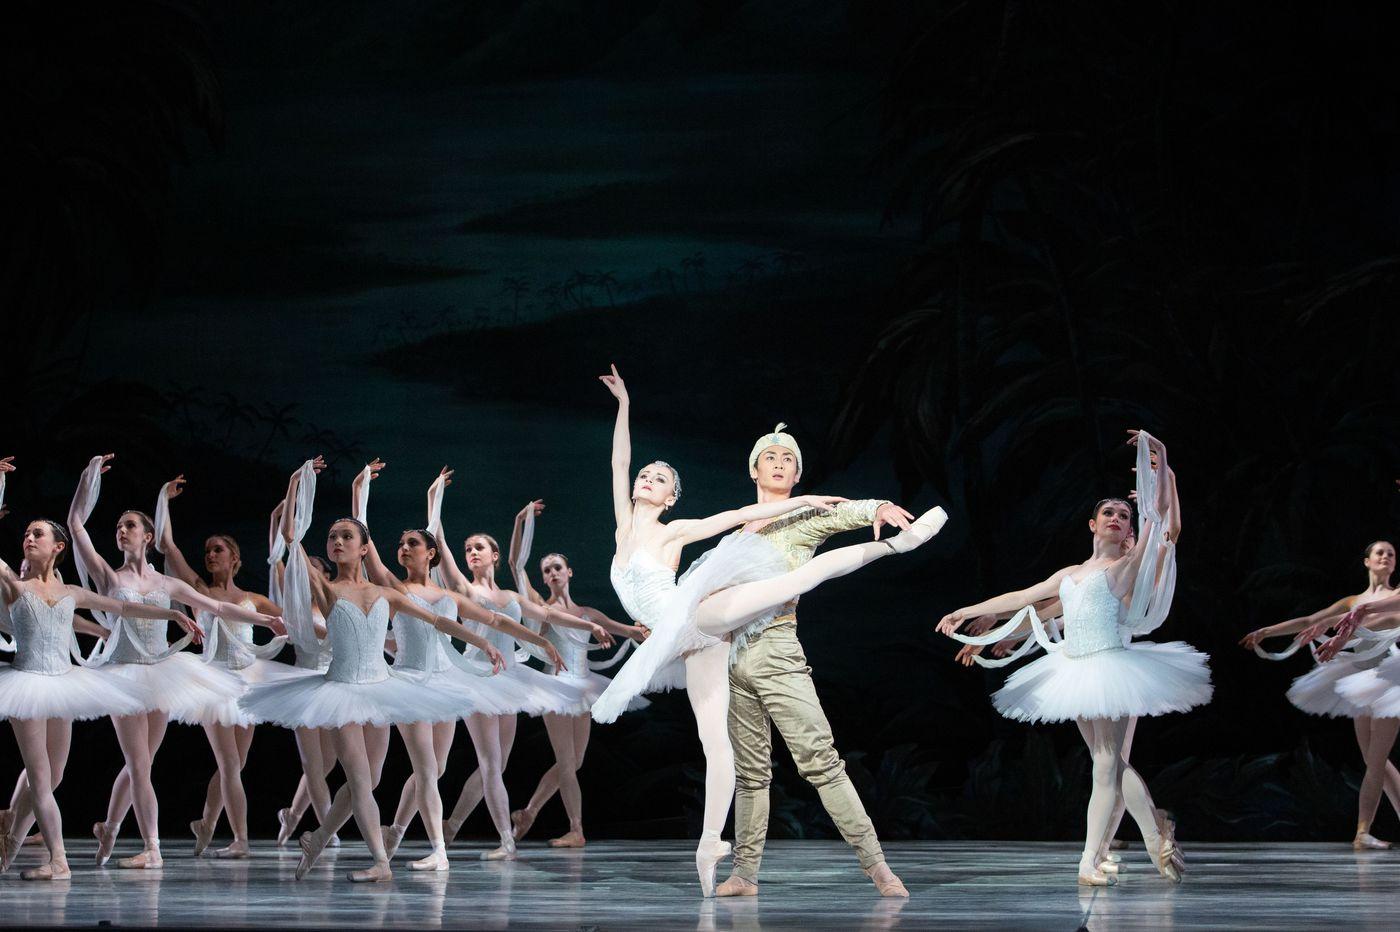 Corella's 'Bayadère' for Pennsylvania Ballet has merit, but stereotypes persist